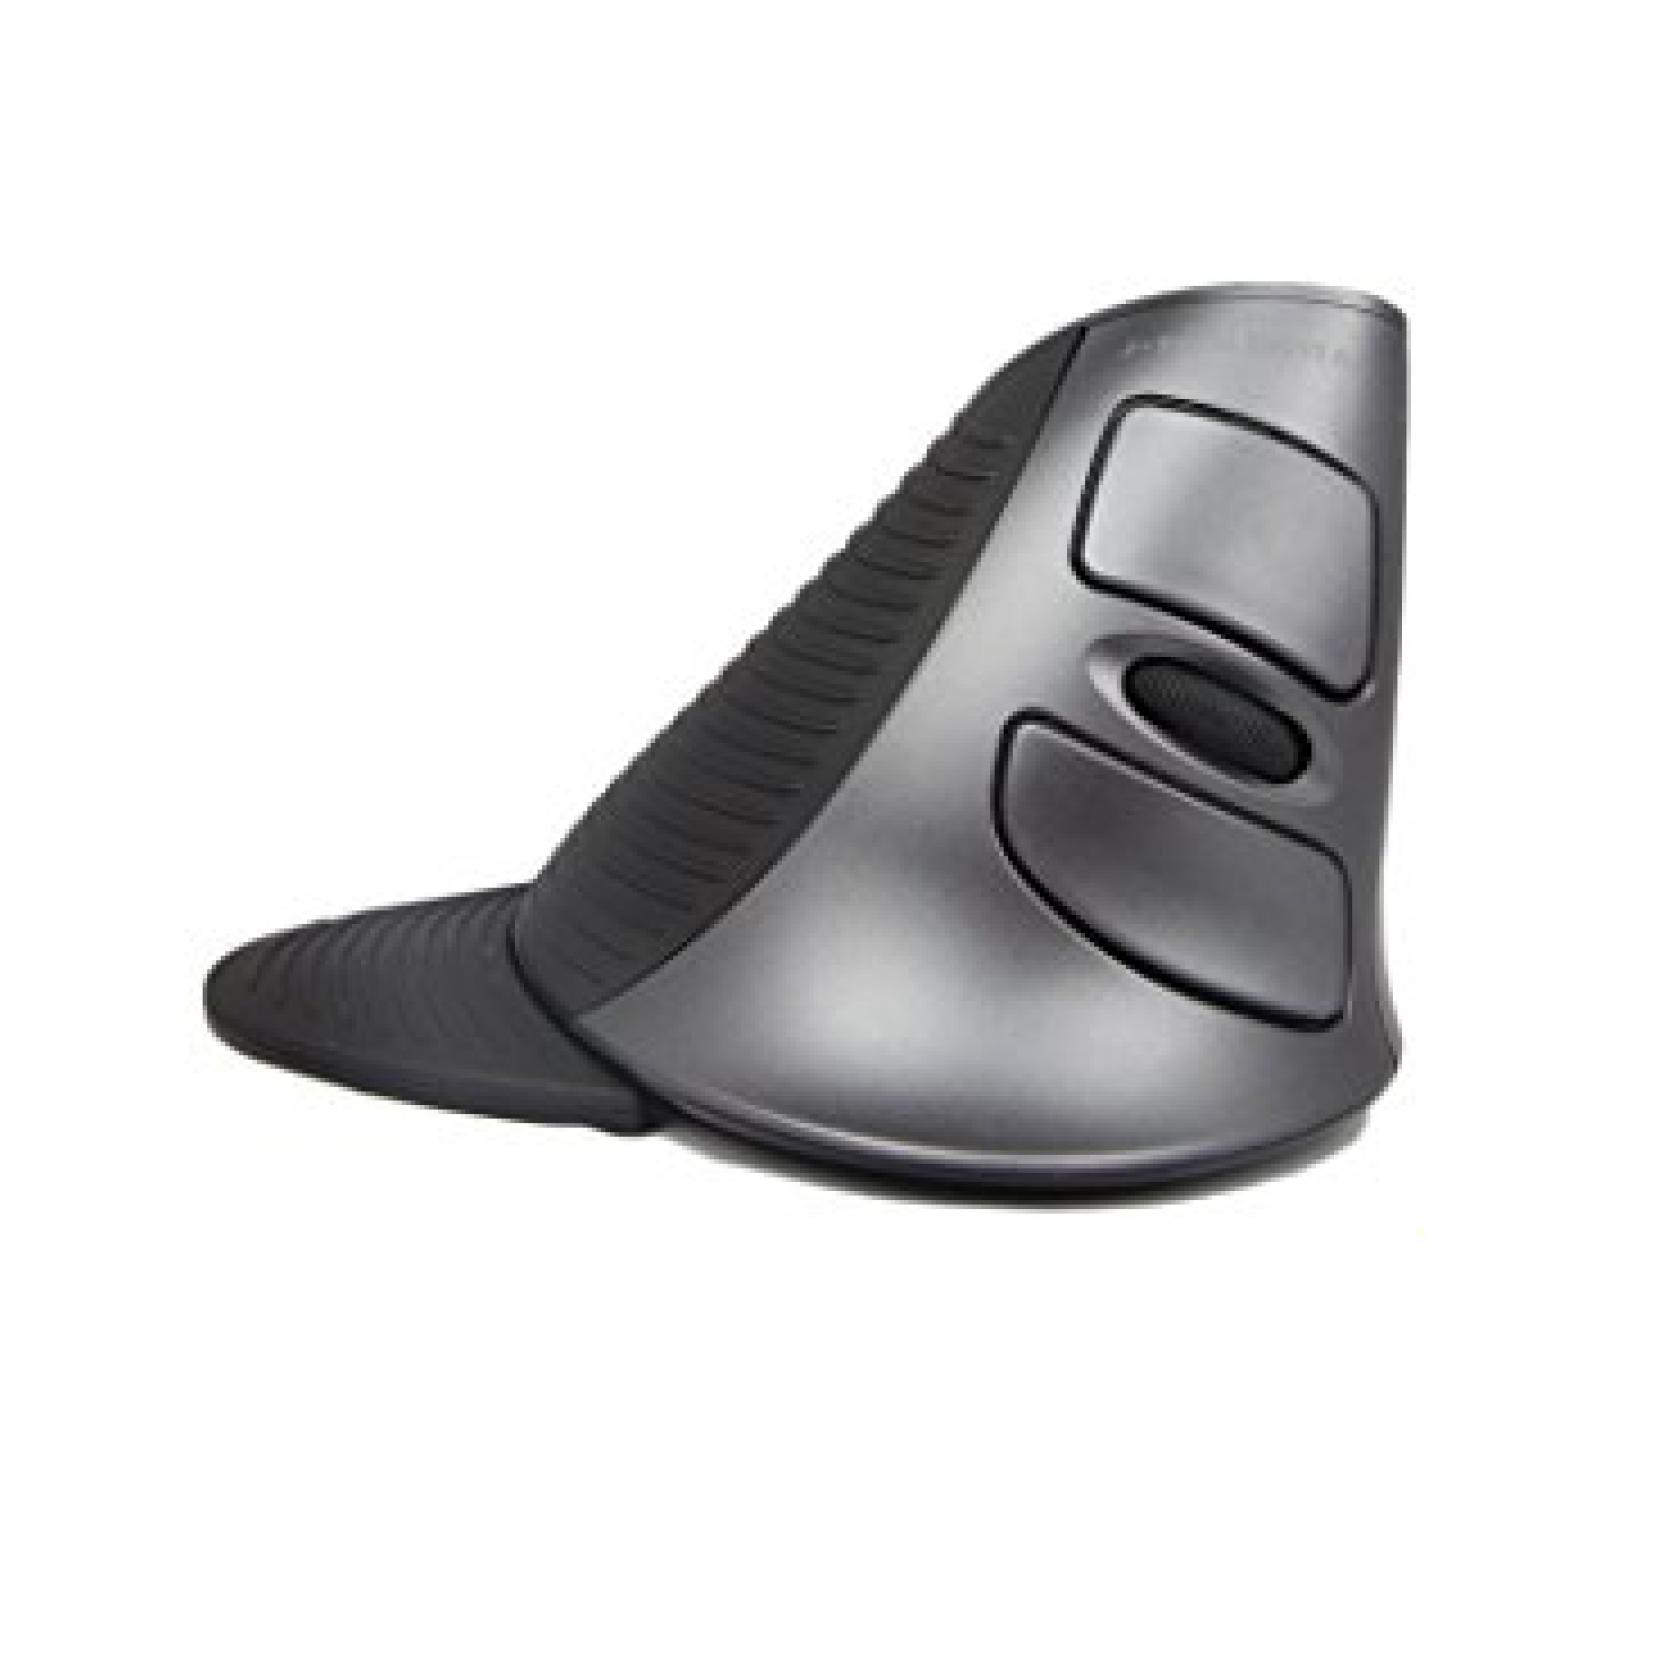 J-tech-digital-scroll-mouse